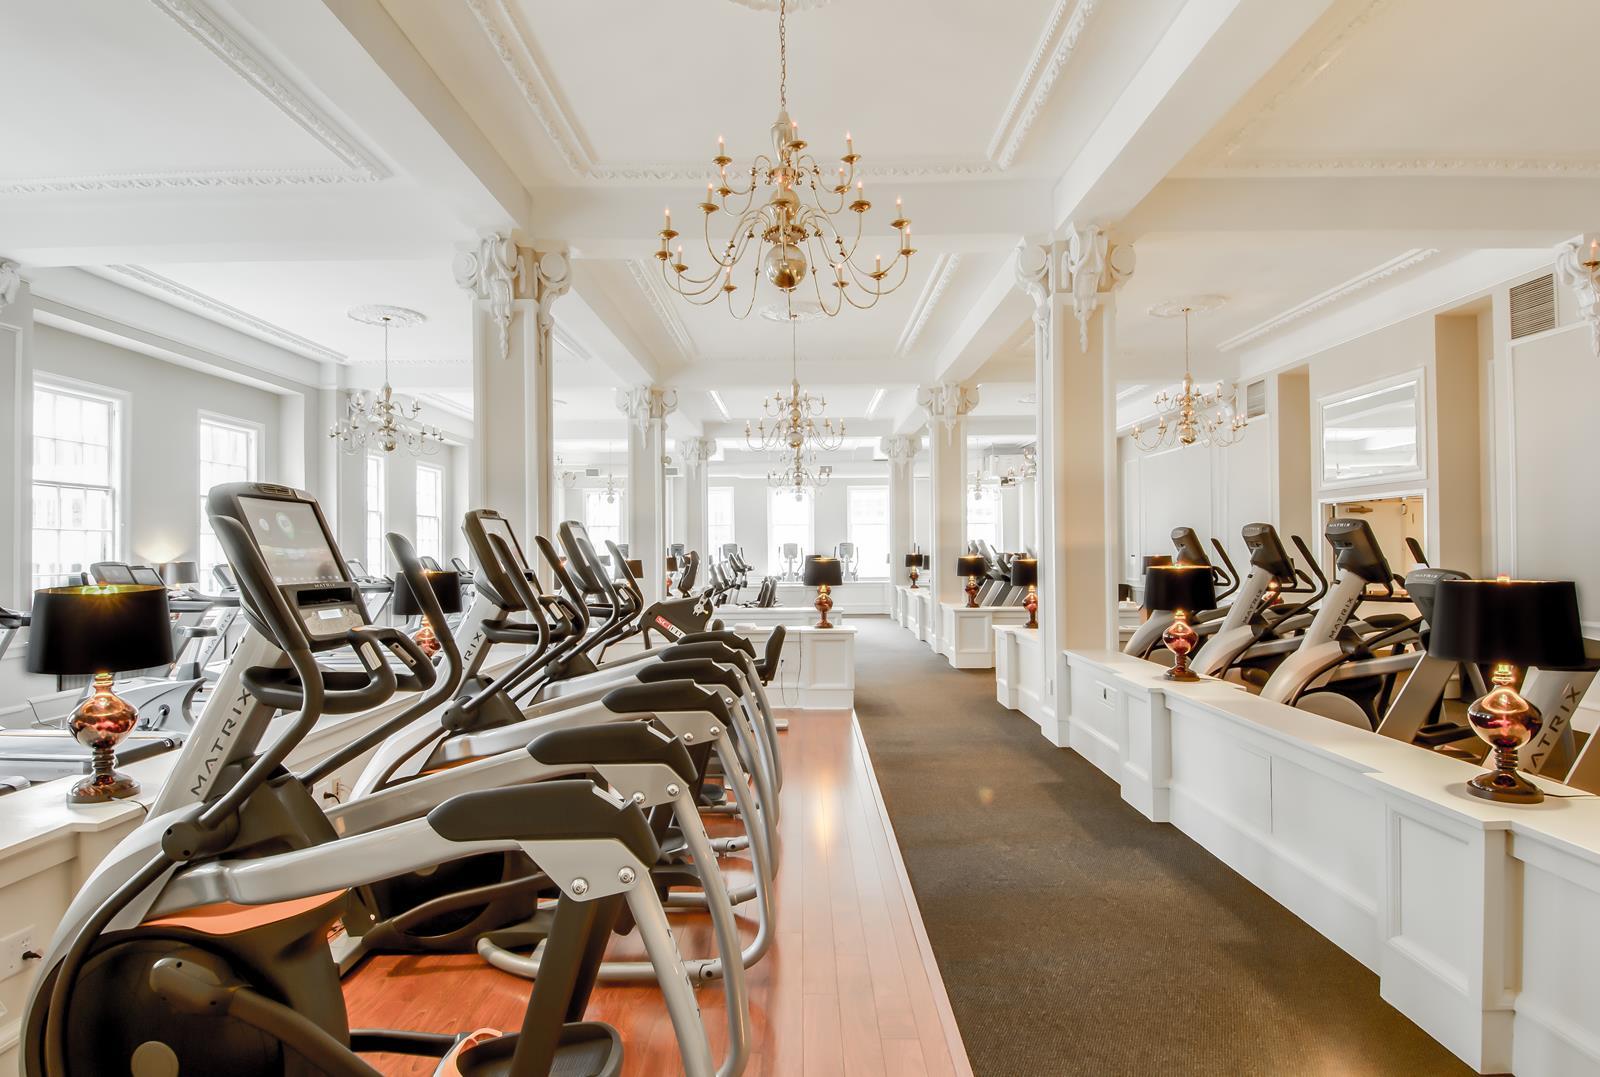 cardio run fitness club workout treadmill elliptical Saint Paul Minnesota